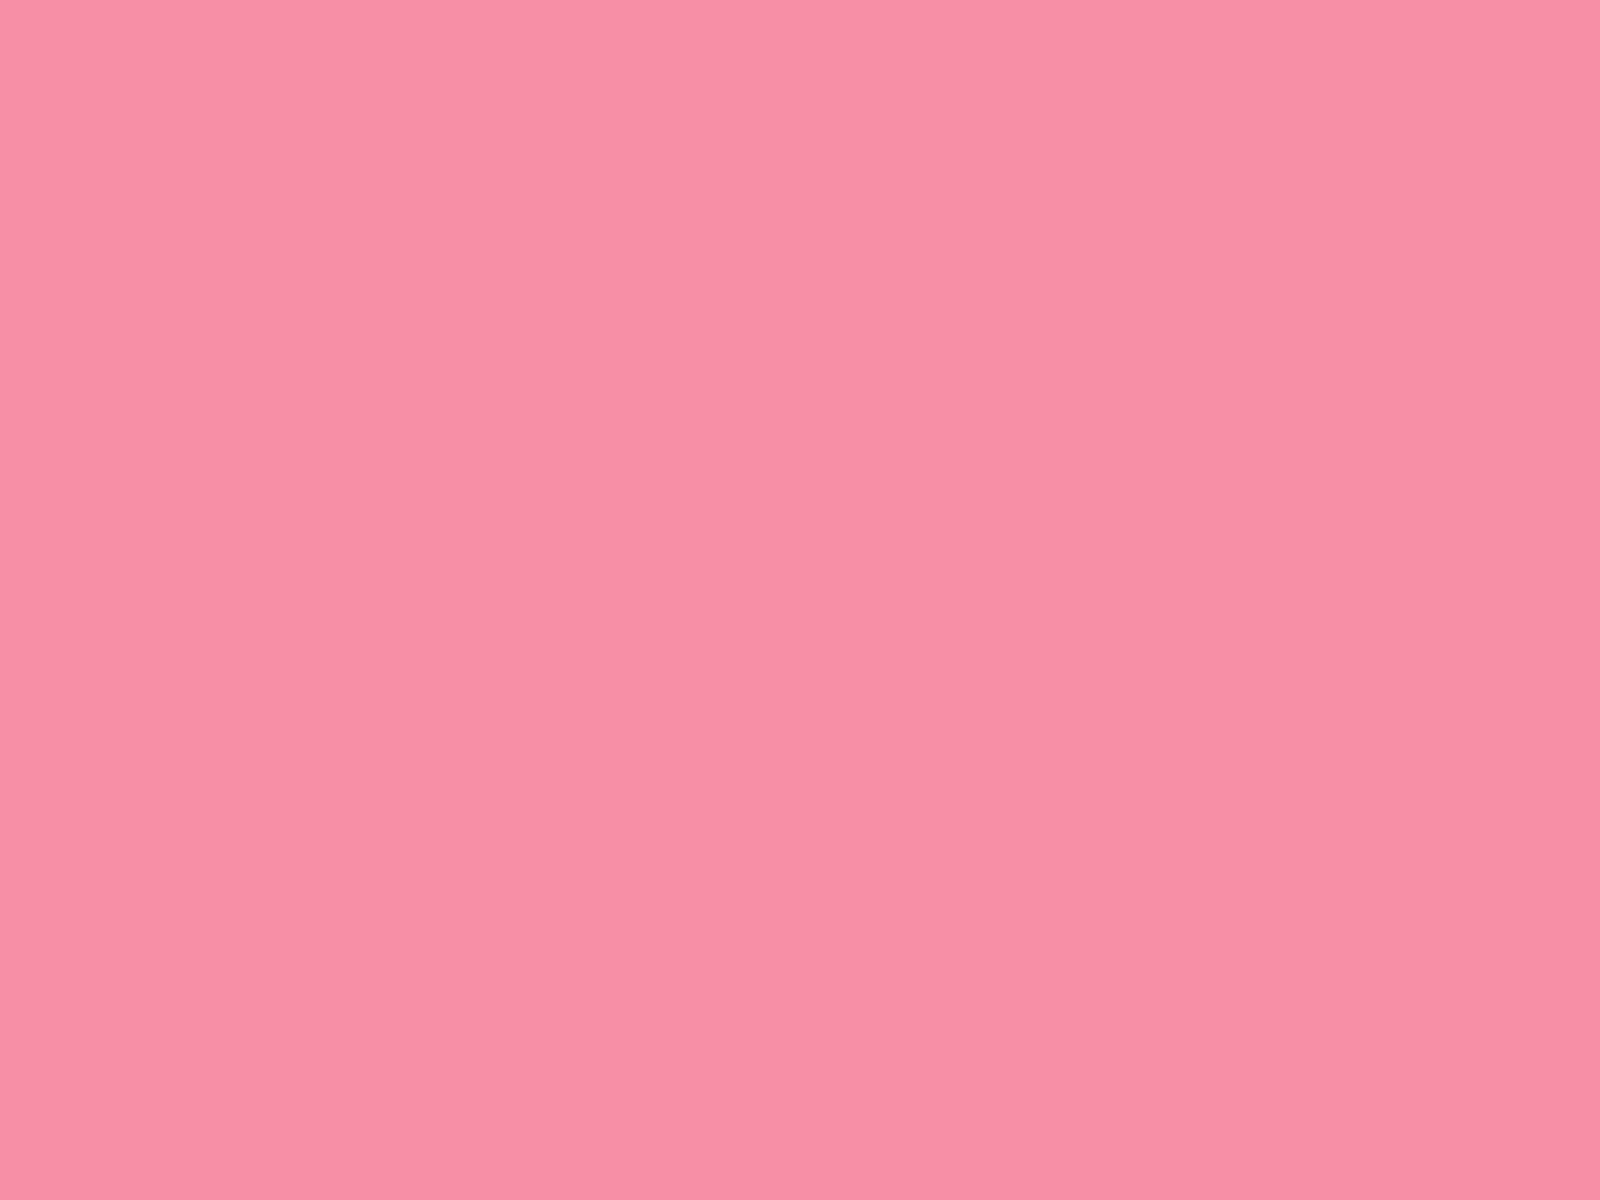 1600x1200 Pink Sherbet Solid Color Background